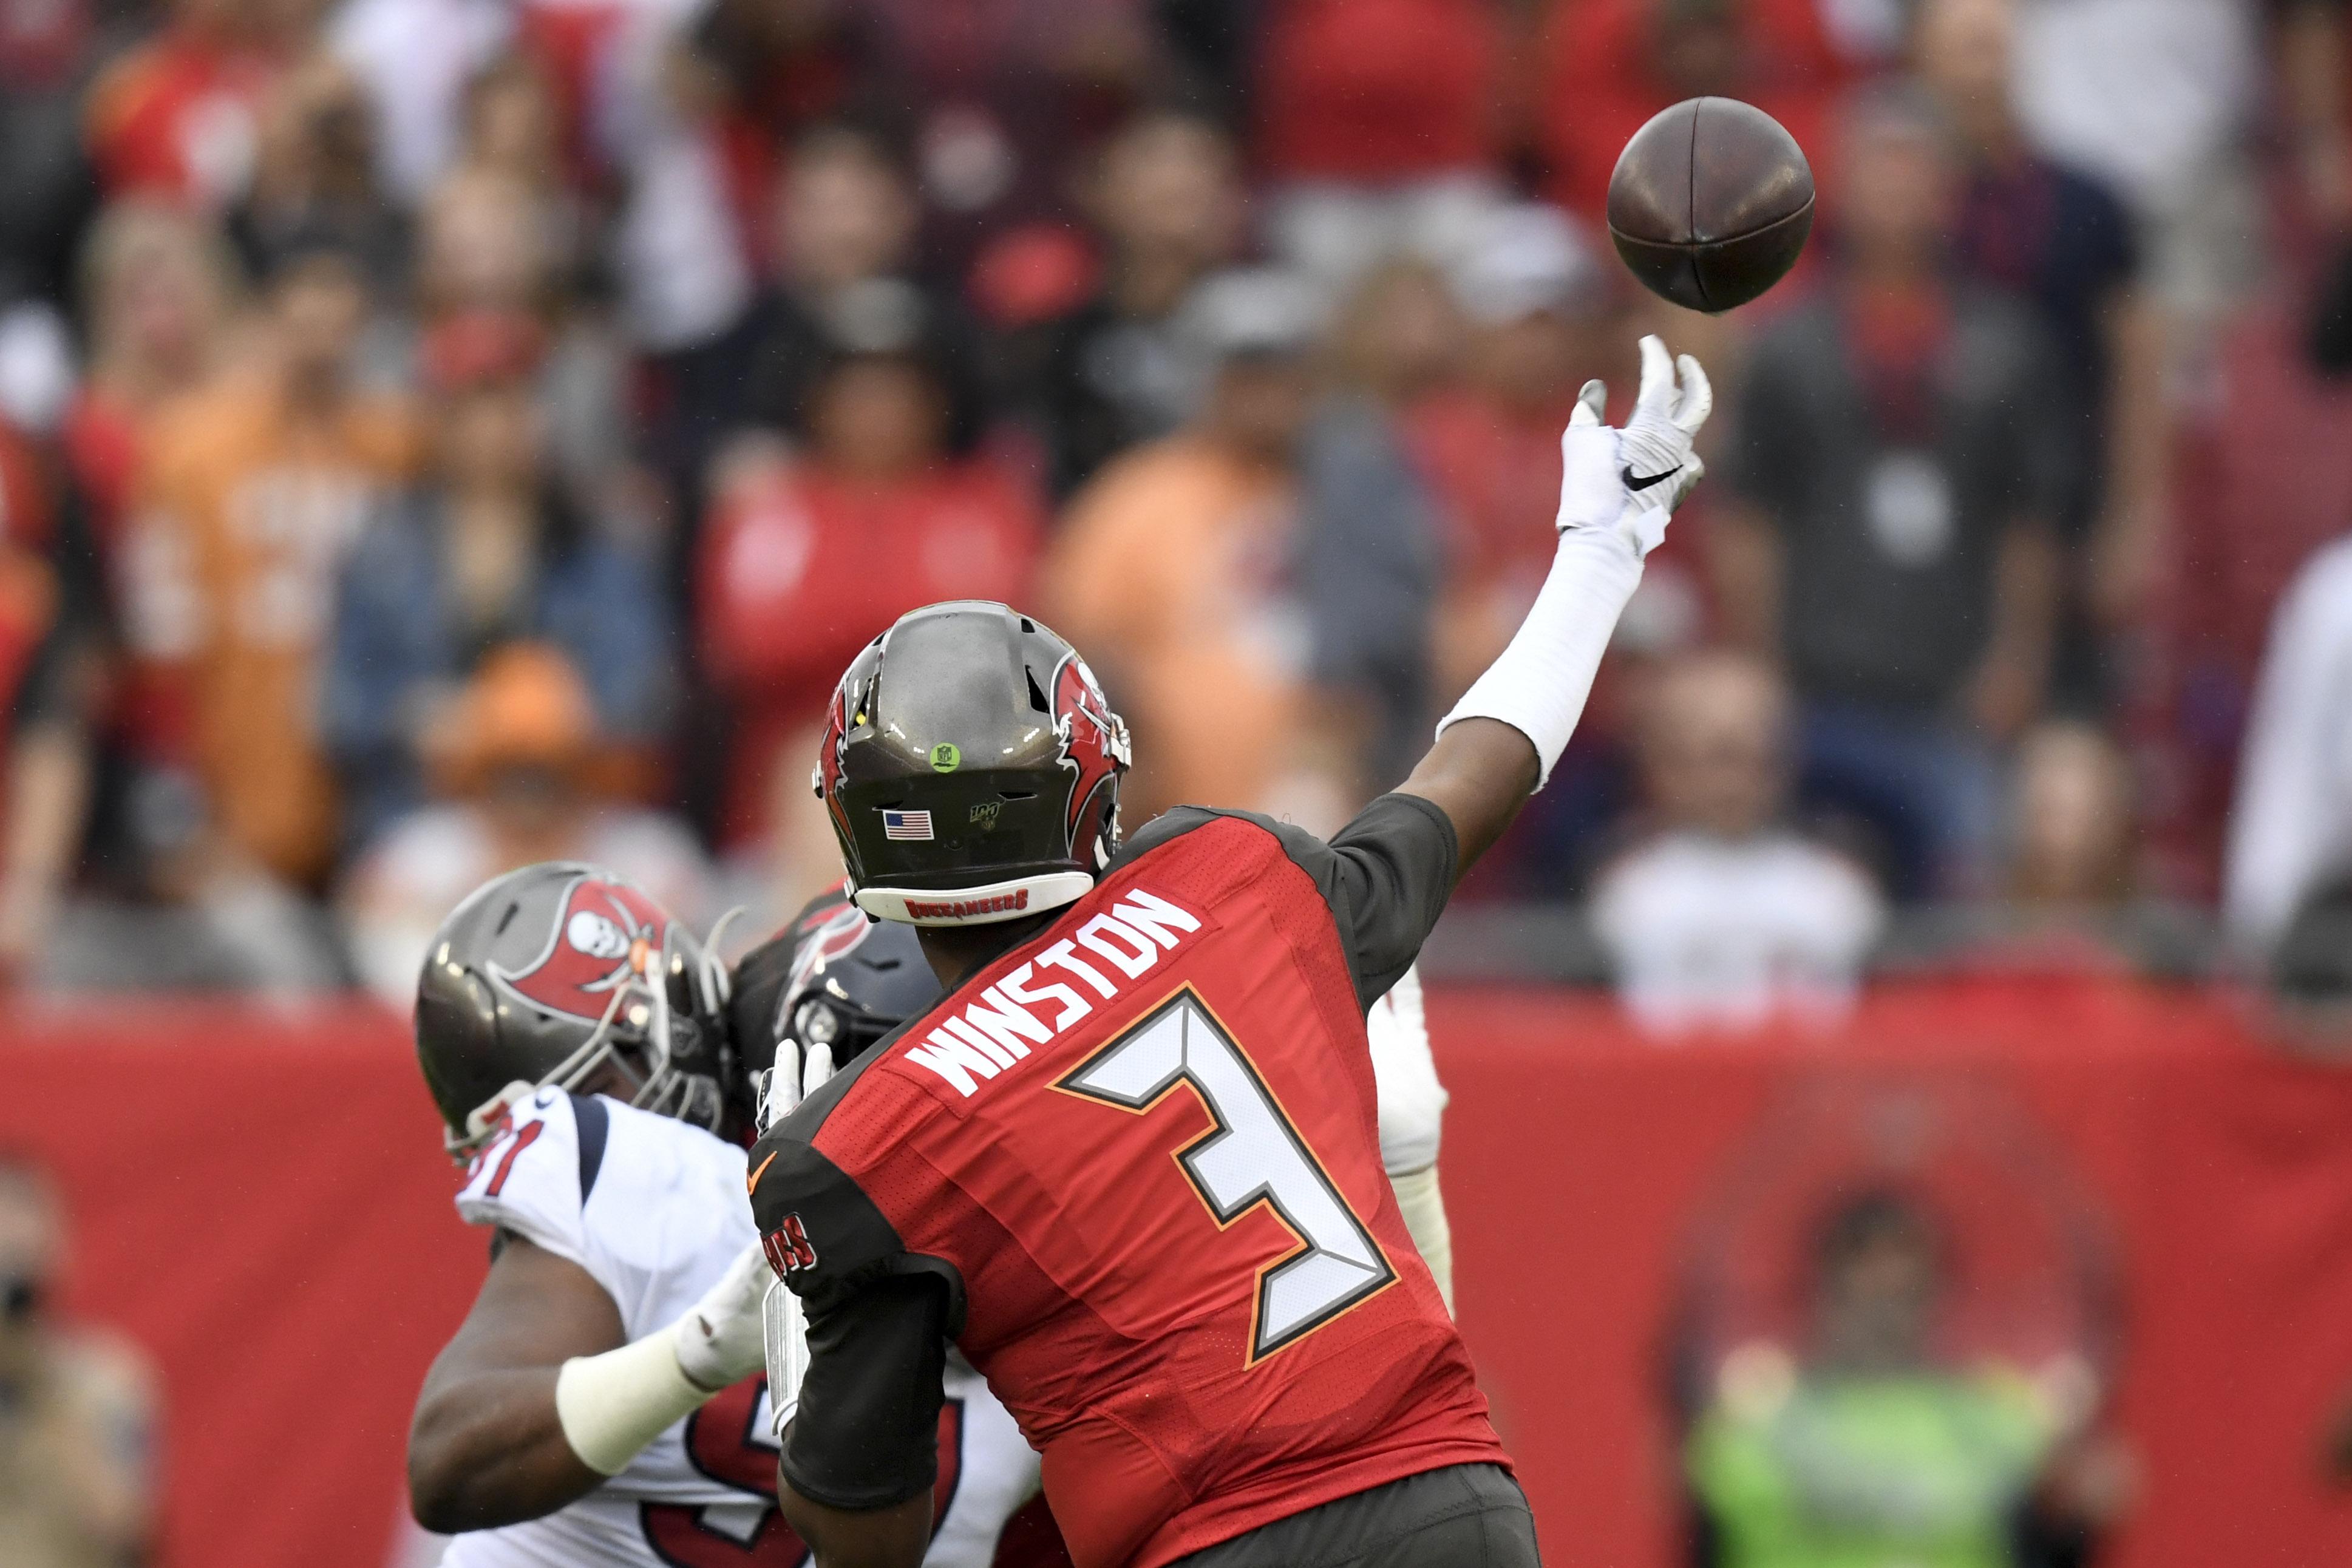 NFL: Houston Texans at Tampa Bay Buccaneers